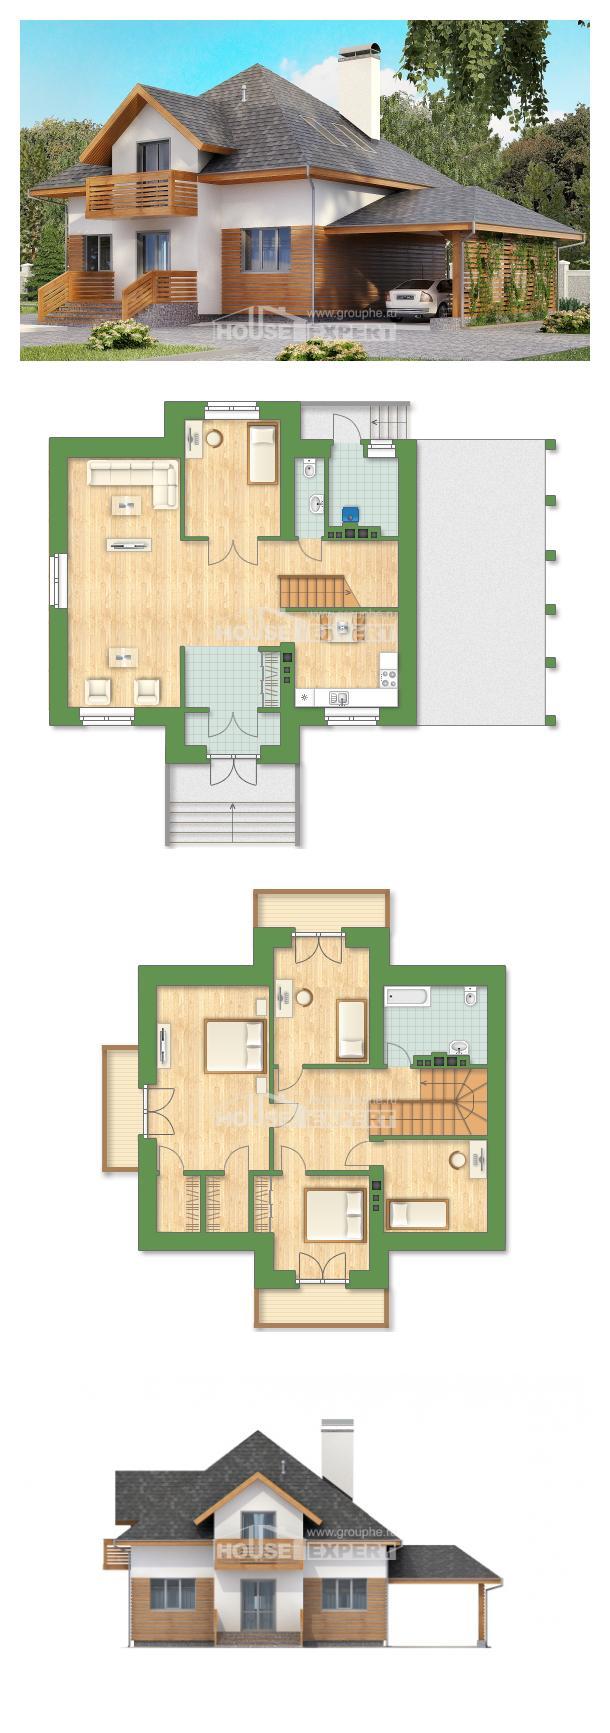 Projekt domu 155-004-R   House Expert